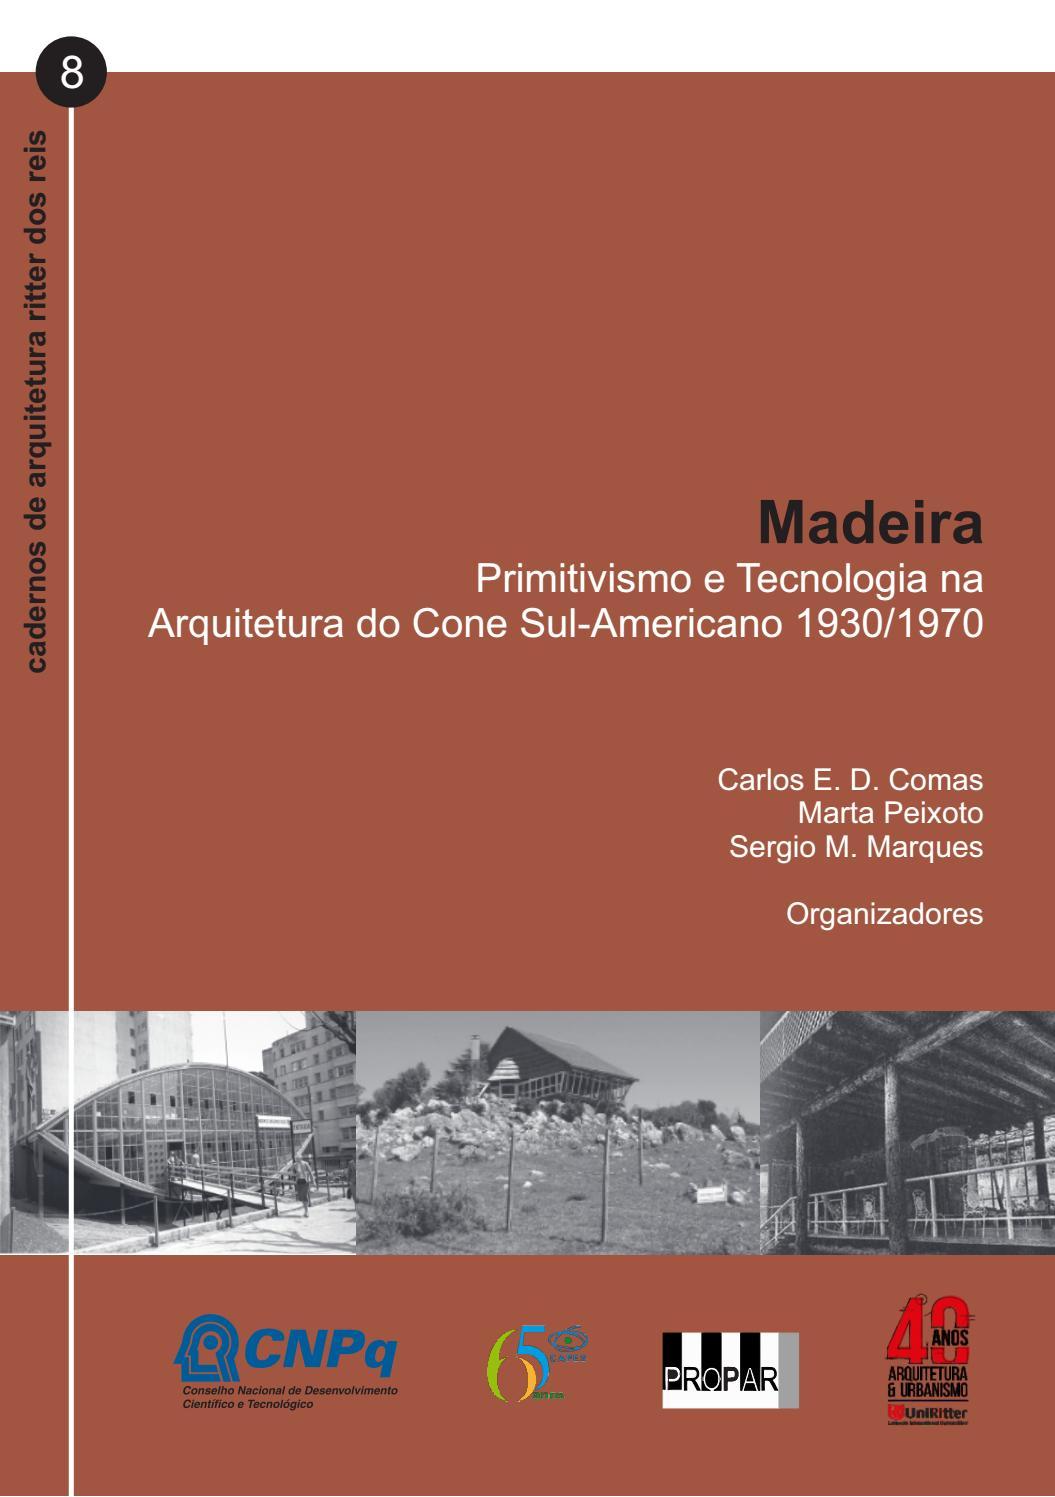 ed4e4ade12 MADEIRA  Primitivismo e Tecnologia na Arquitetura do Cone Sul-Americano  1930 1970 by Editora UniRitter - issuu